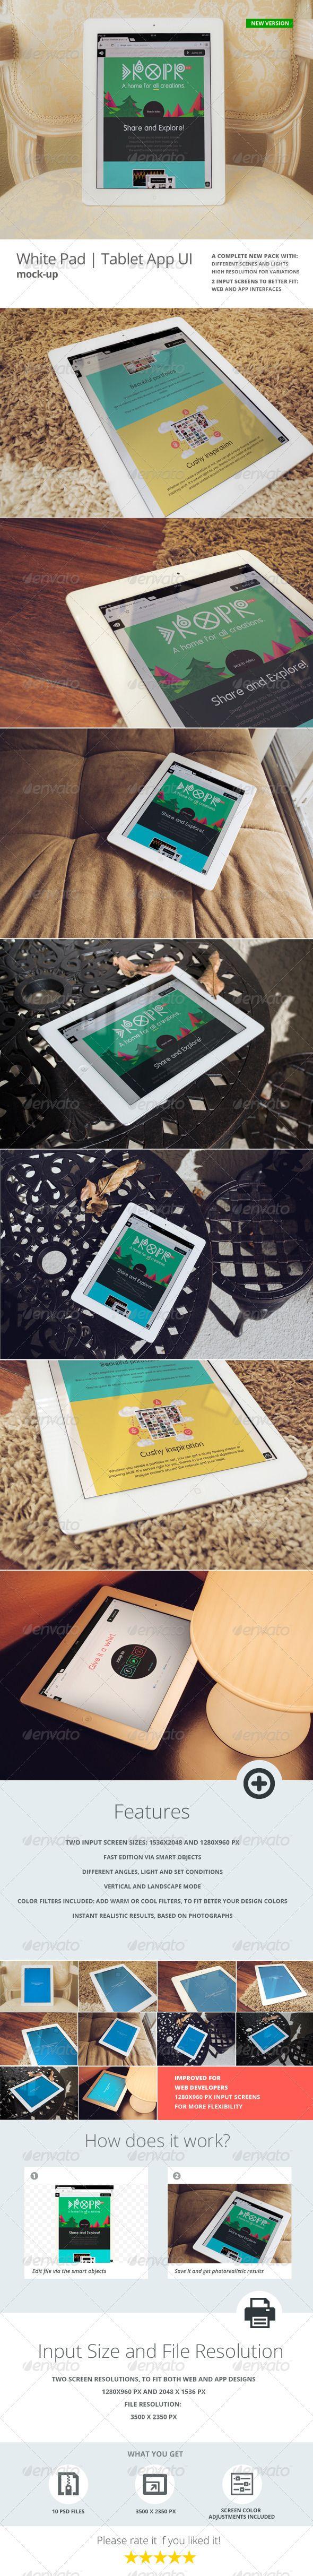 White Pad | Tablet App UI Mock-Up